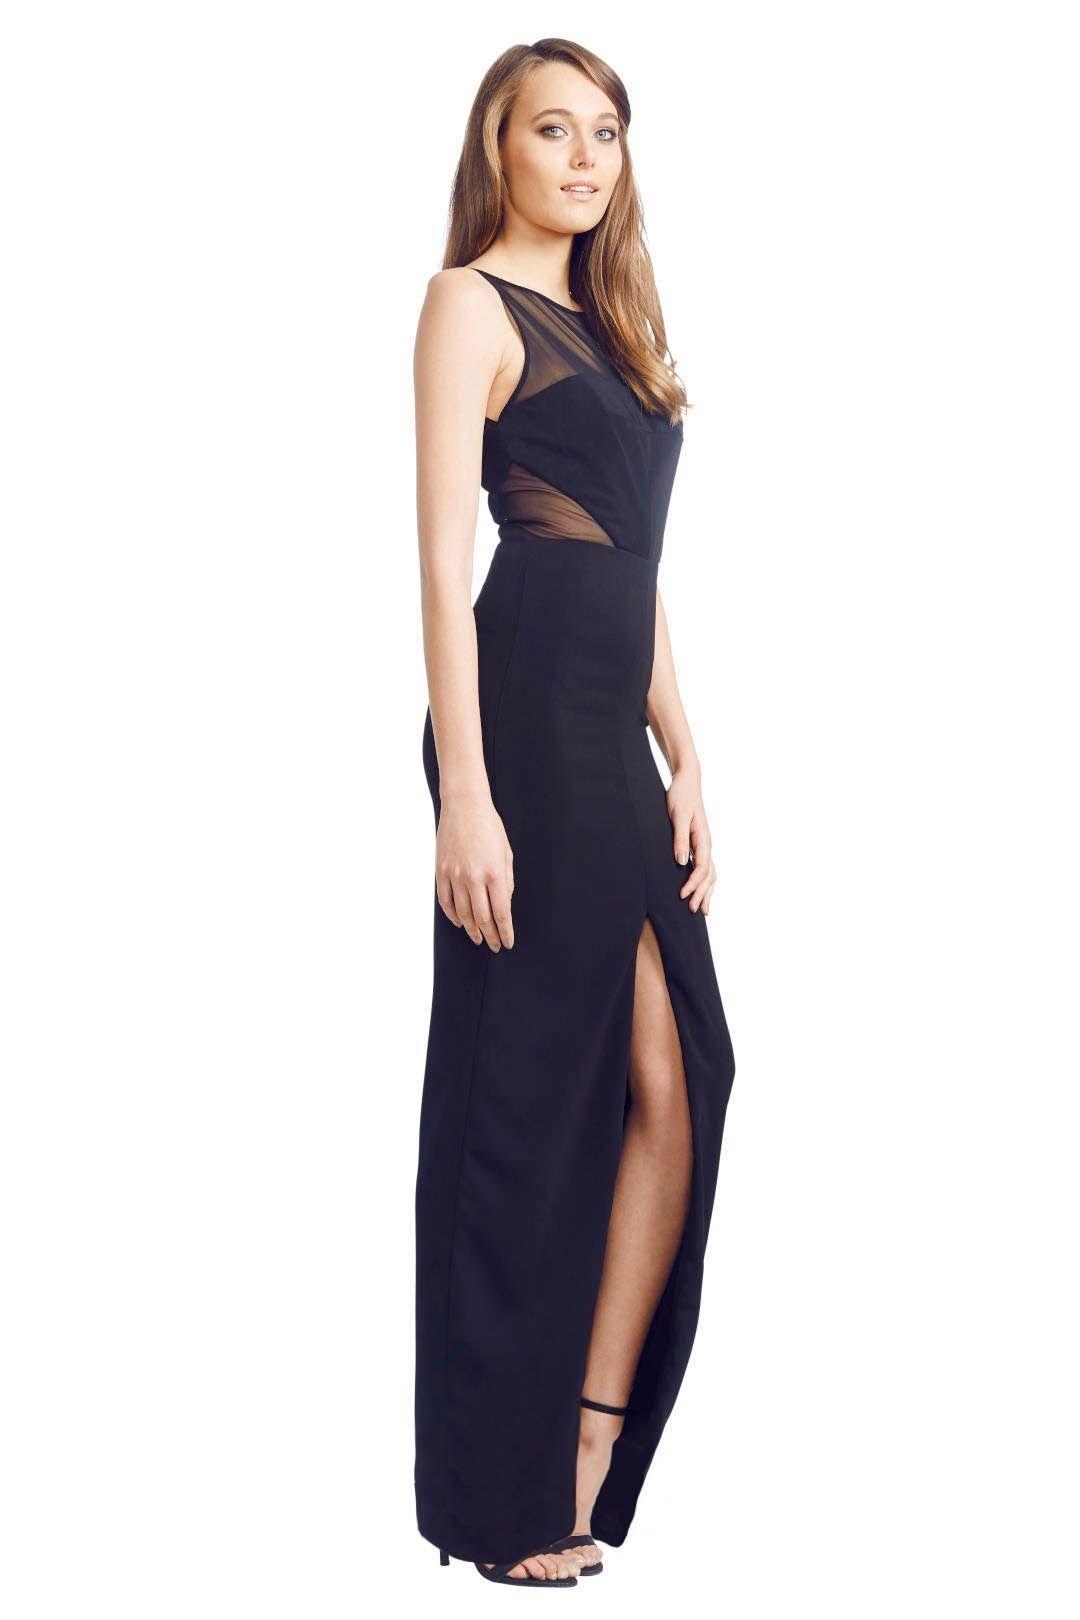 Badgley Mischka - Panel Gown - Black - Side